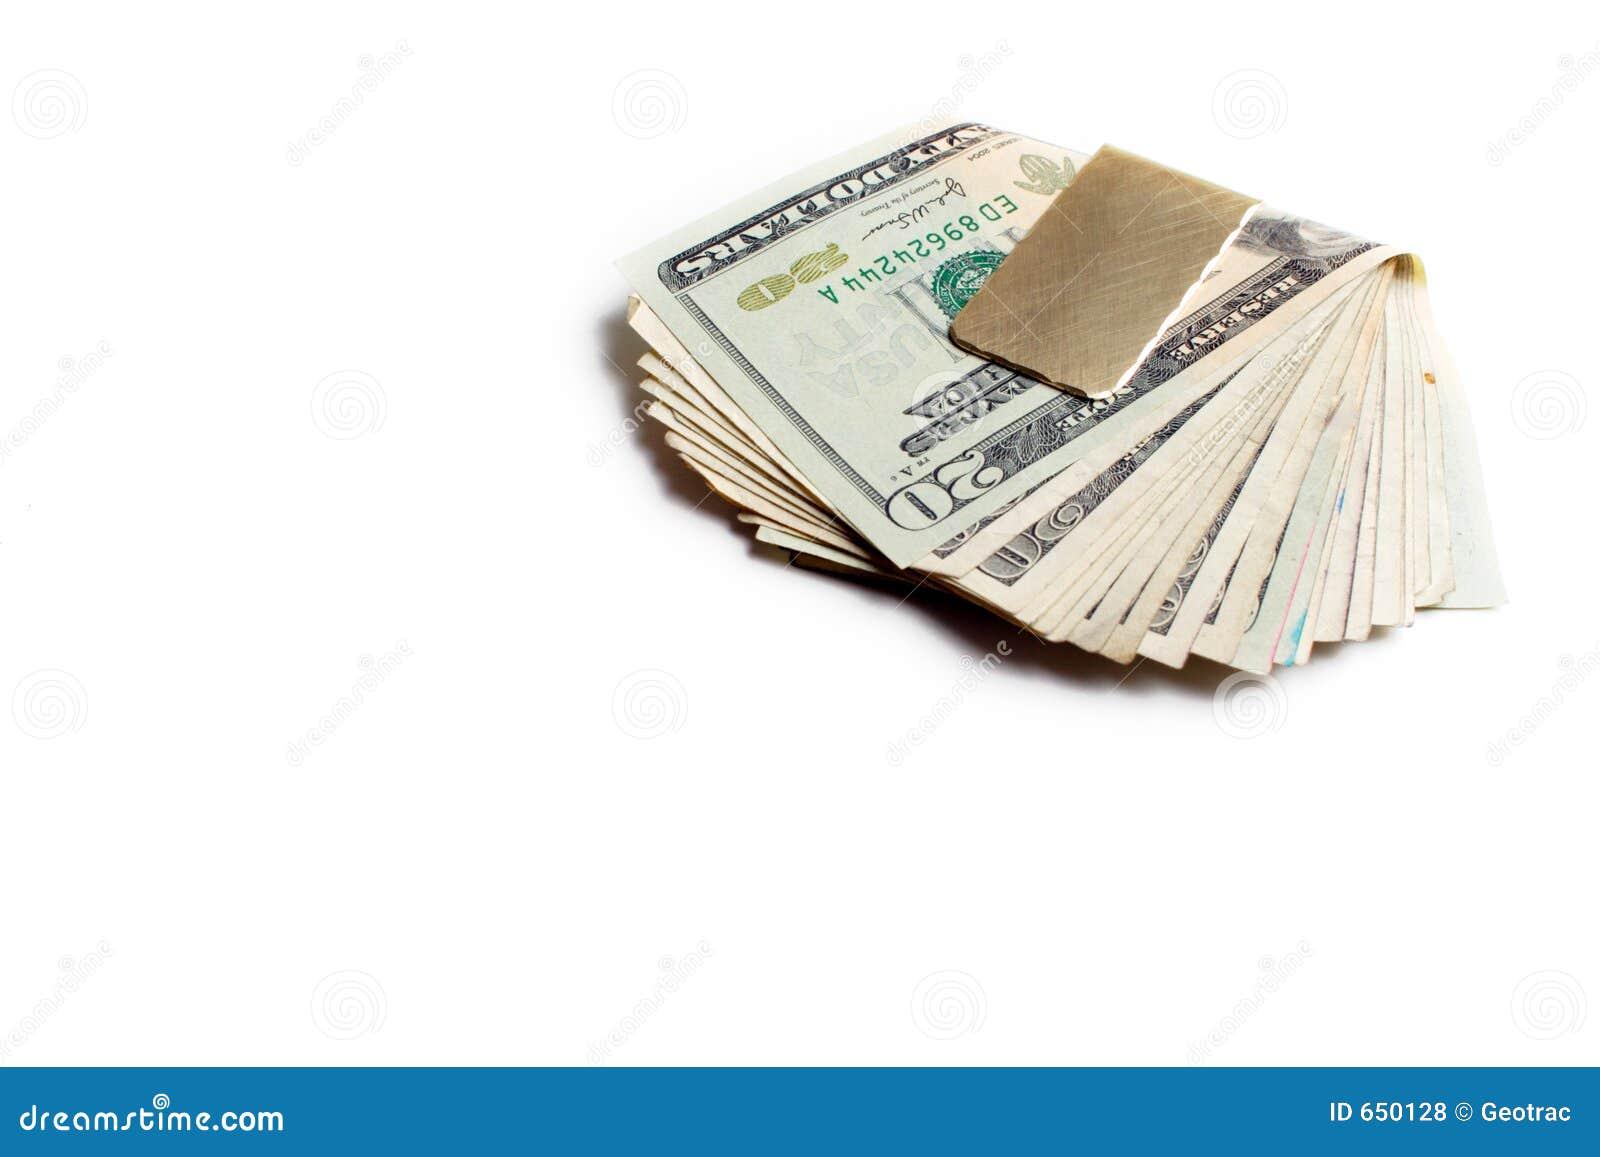 Clip money